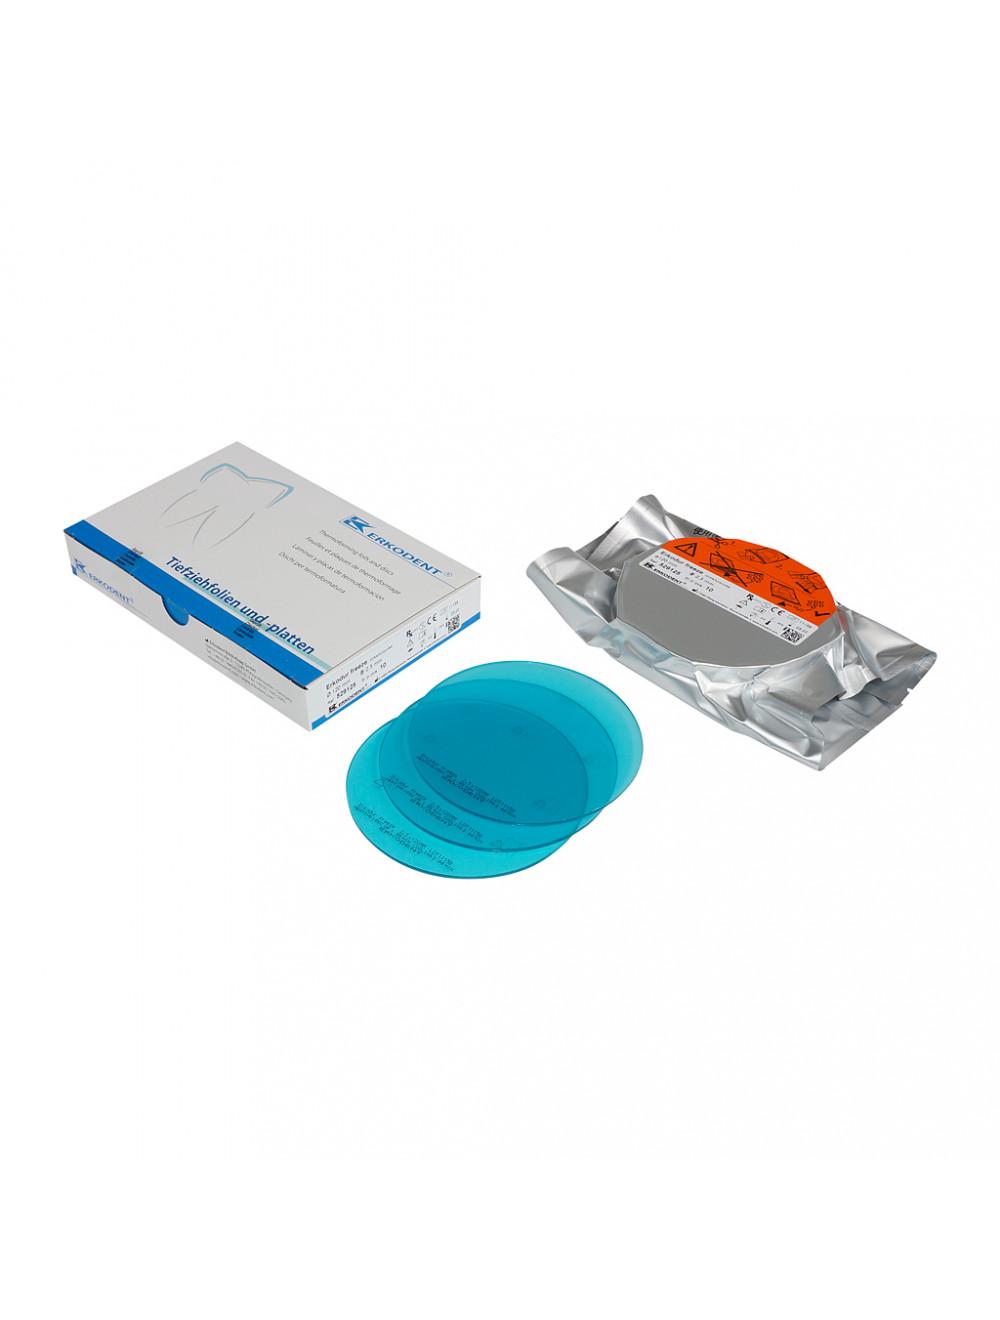 Erkodent Erkodur Tiefziehfolie freeze türkis-transparent, 2 mm, 10 Stück 529120